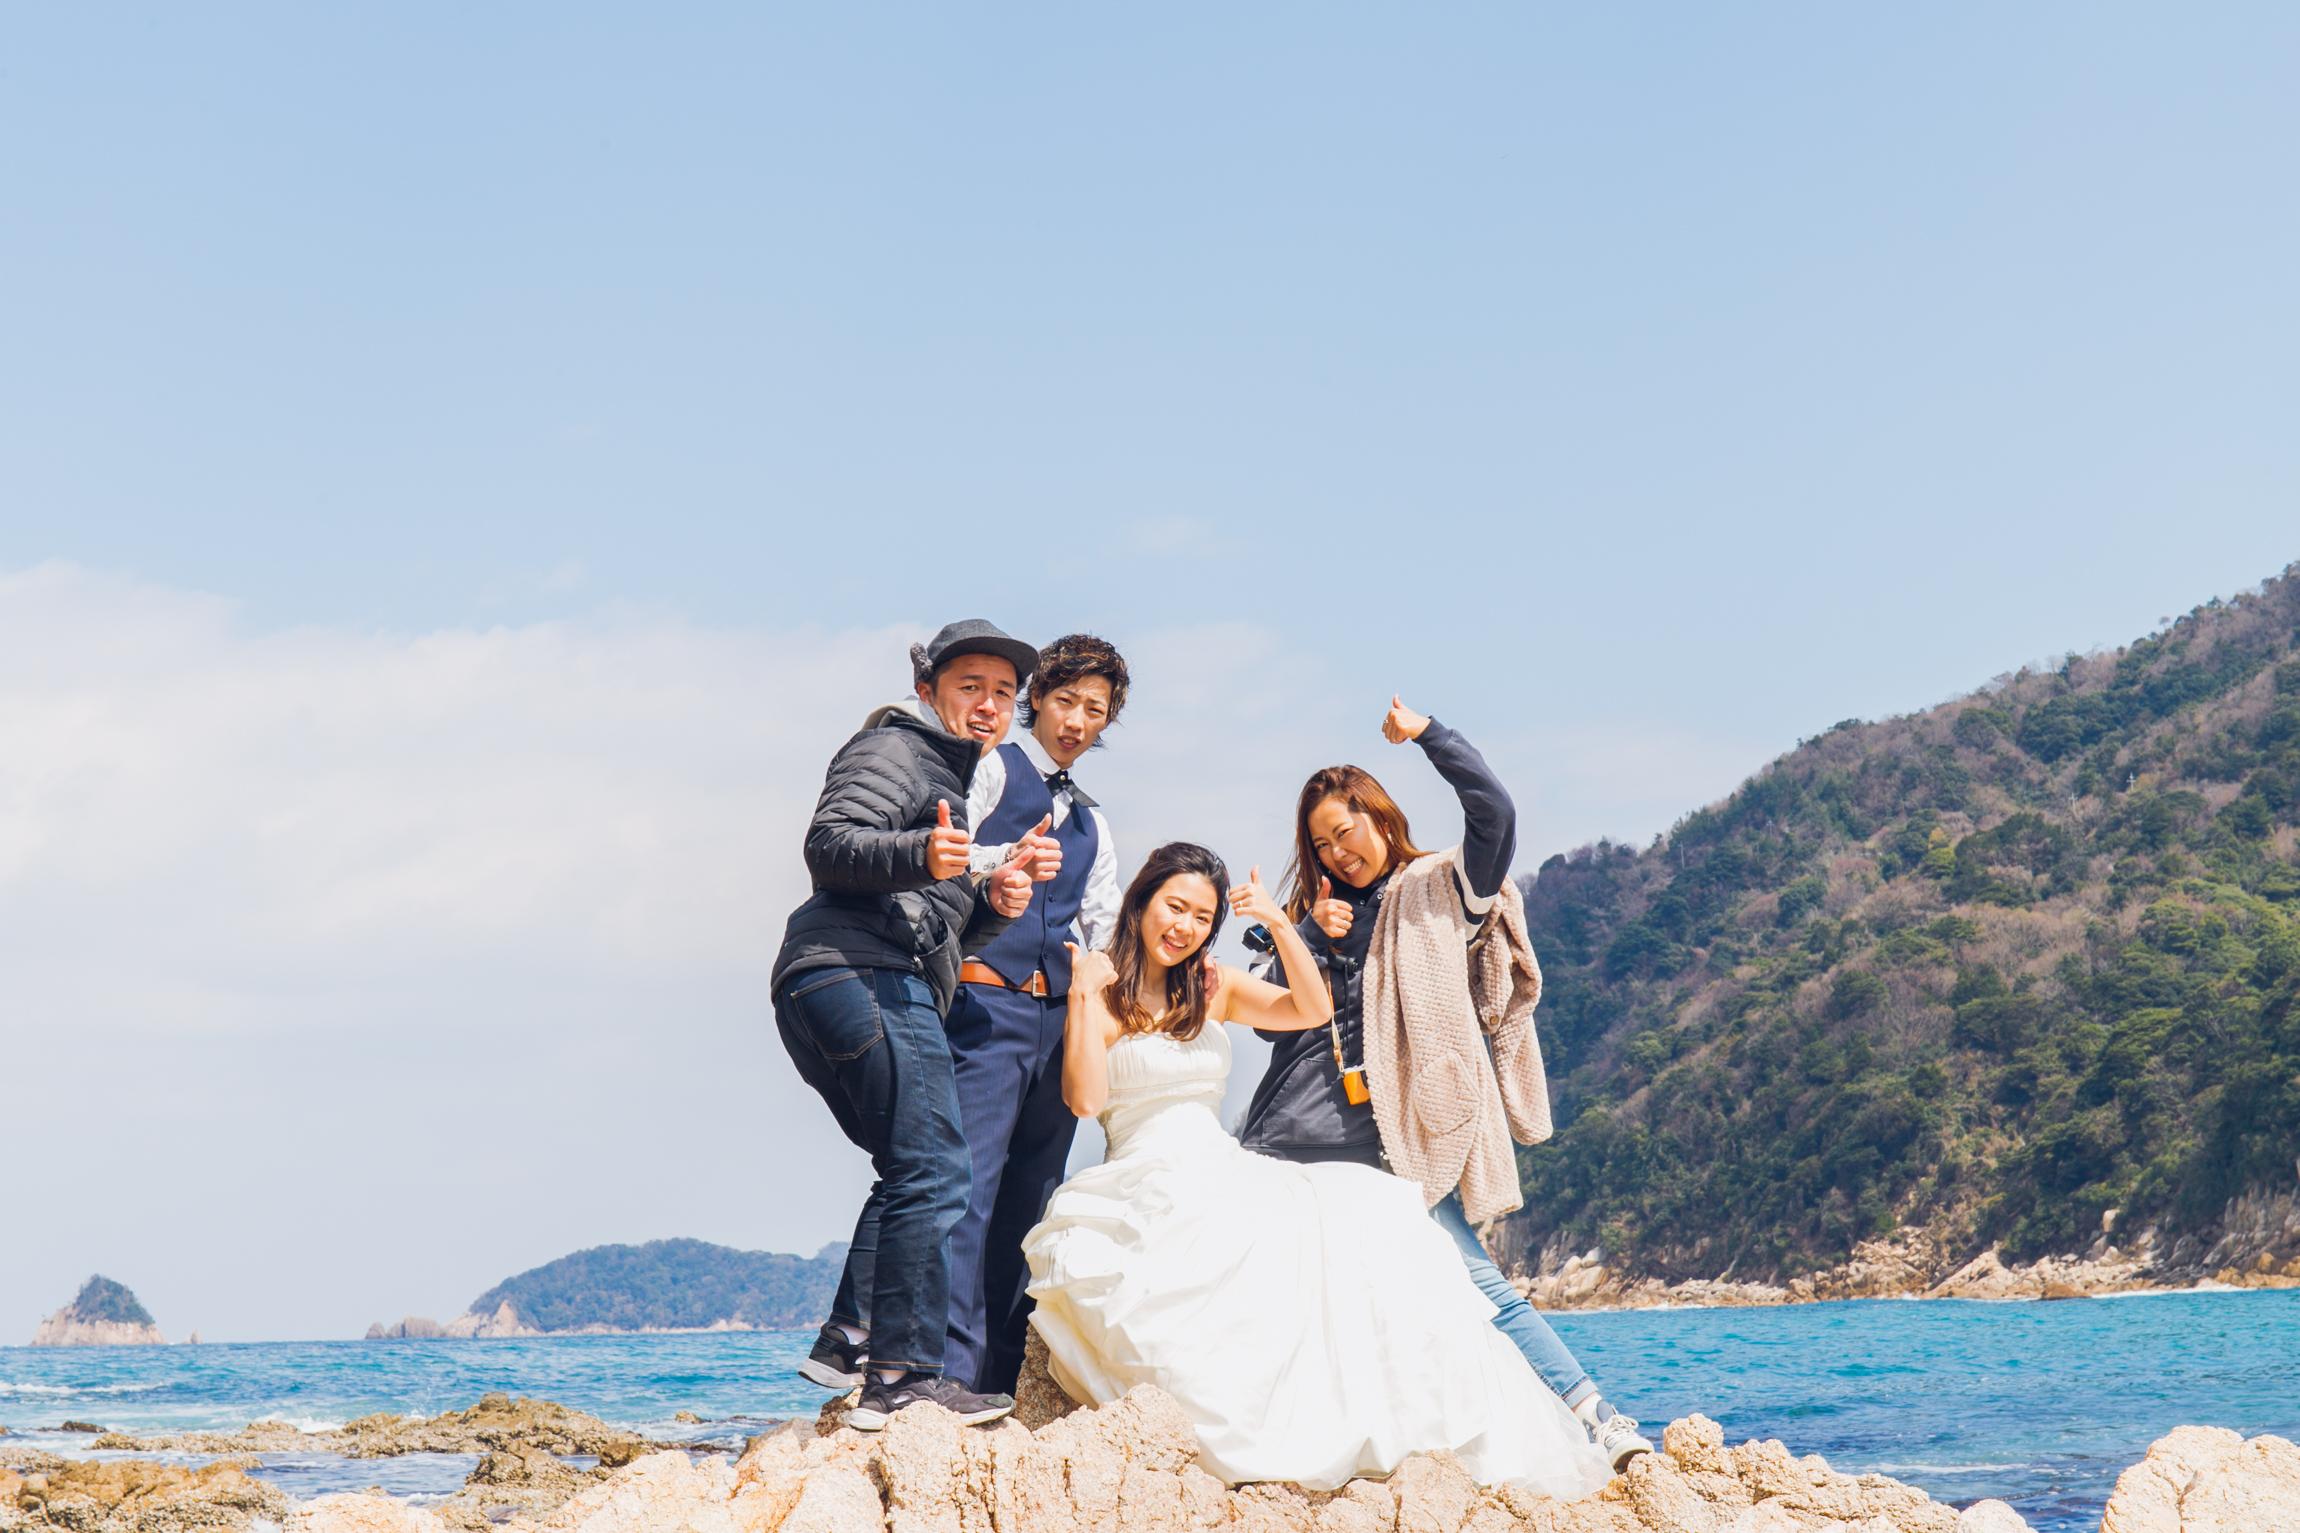 wedding photo guider tour in Kyoto, Osaka and Tokyo